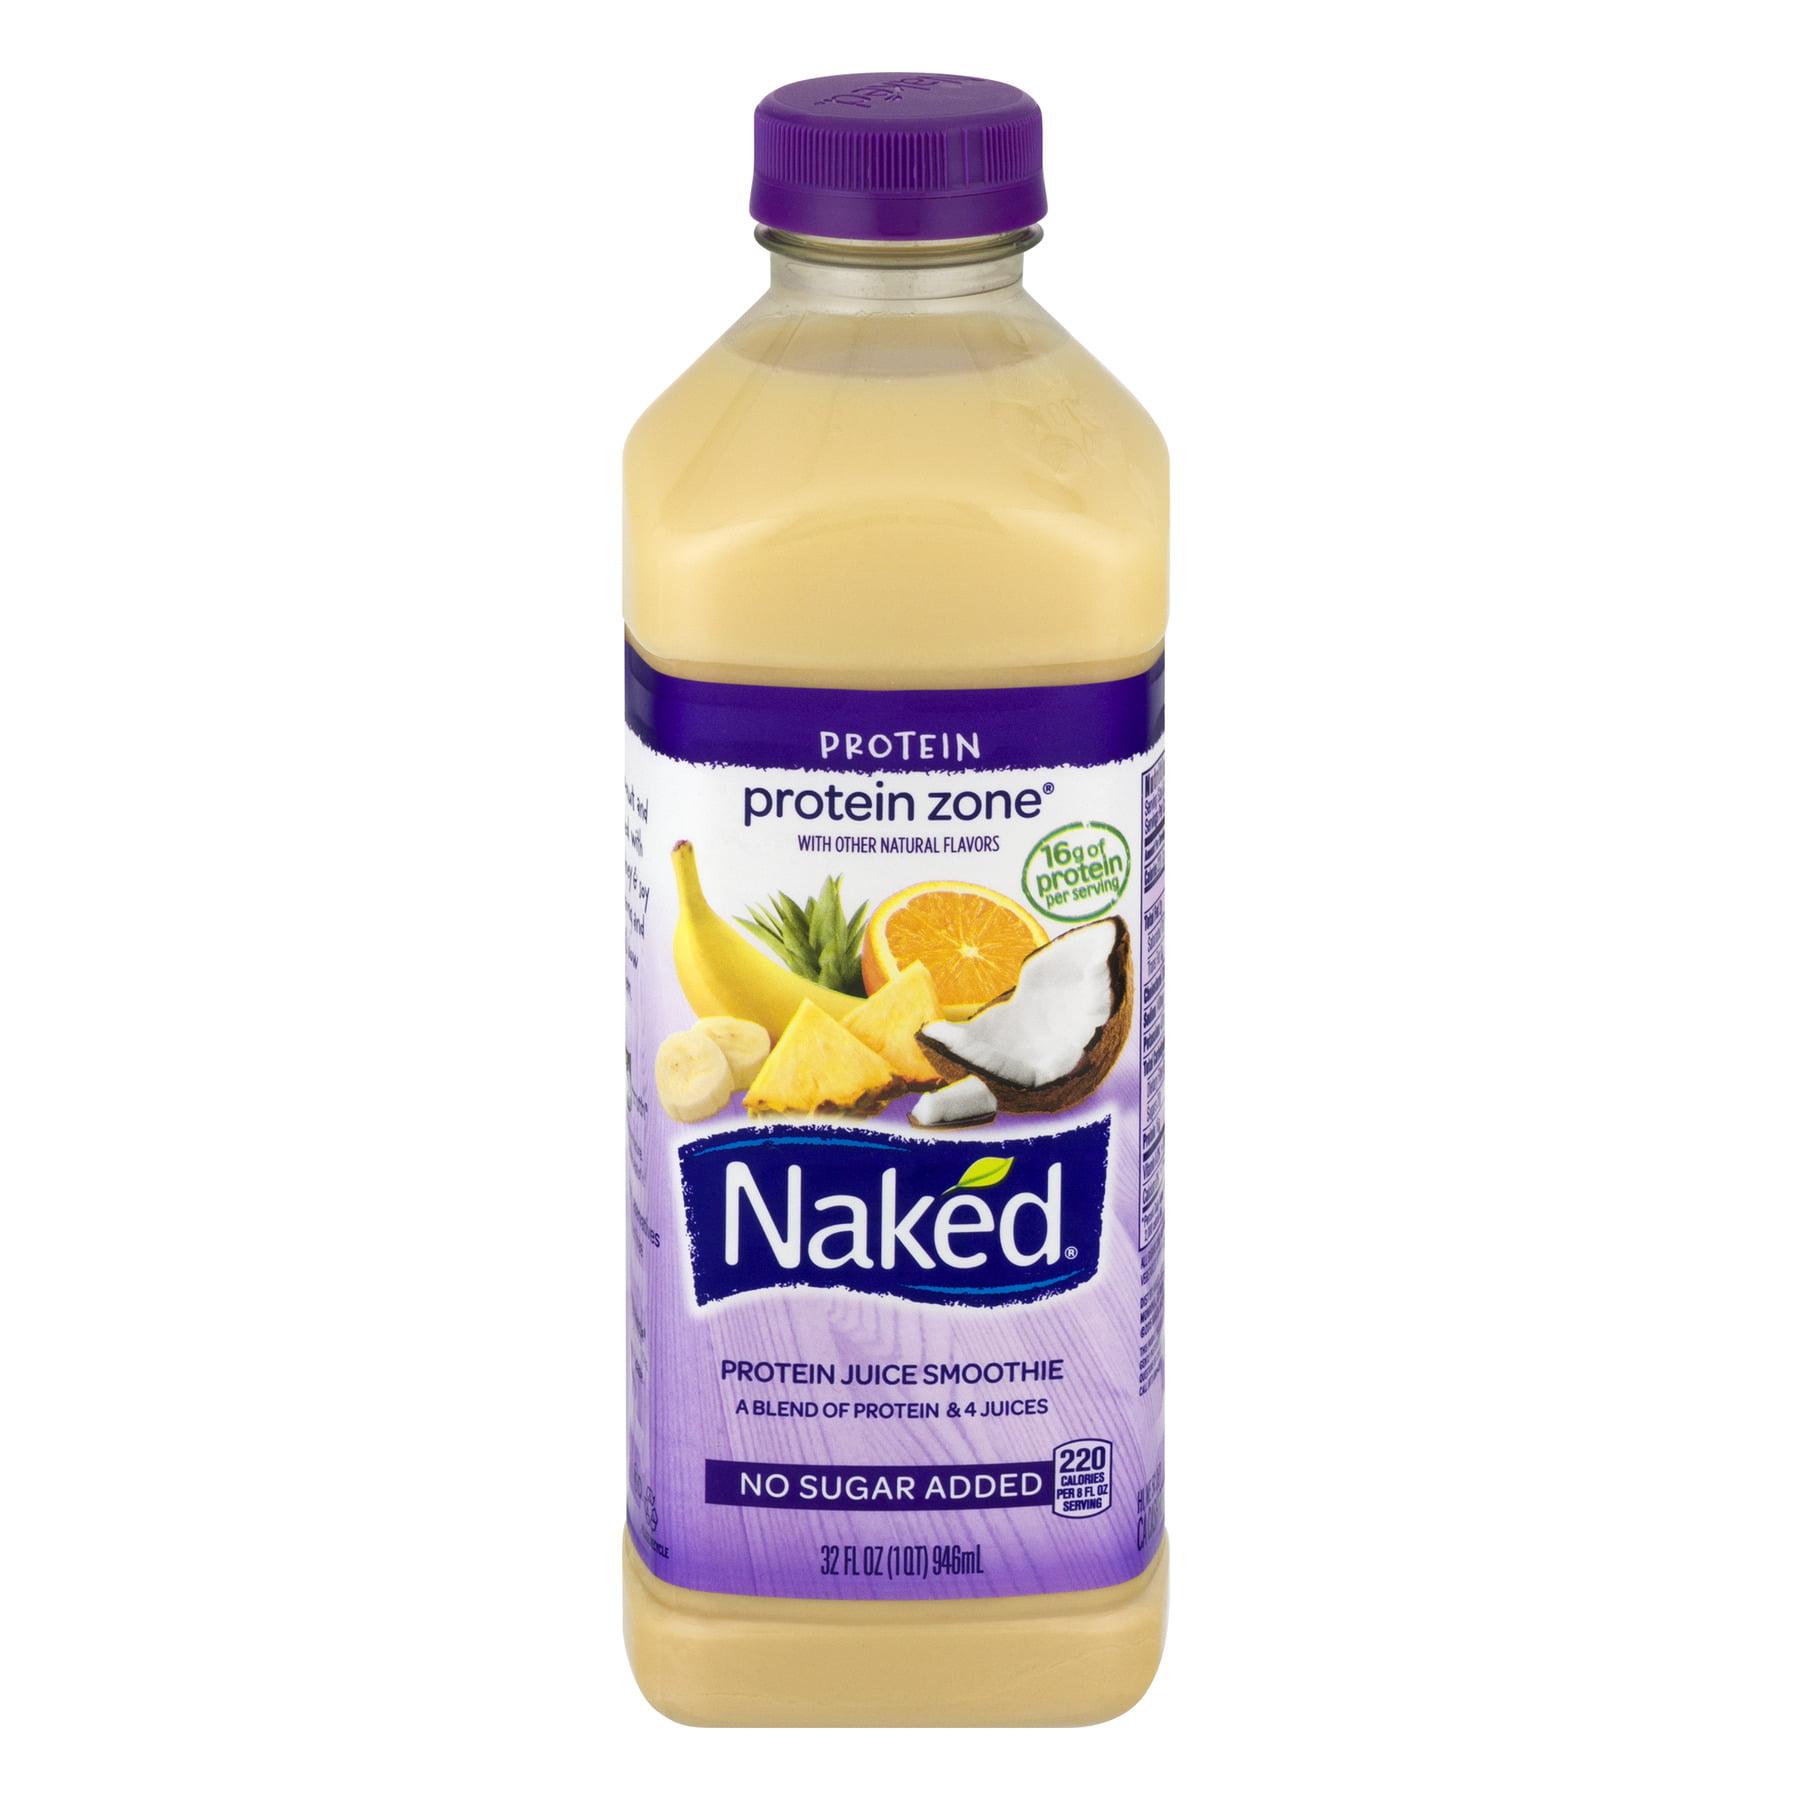 Naked Protein Zone Protein Juice Smoothie 15.2 oz Reviews 2021